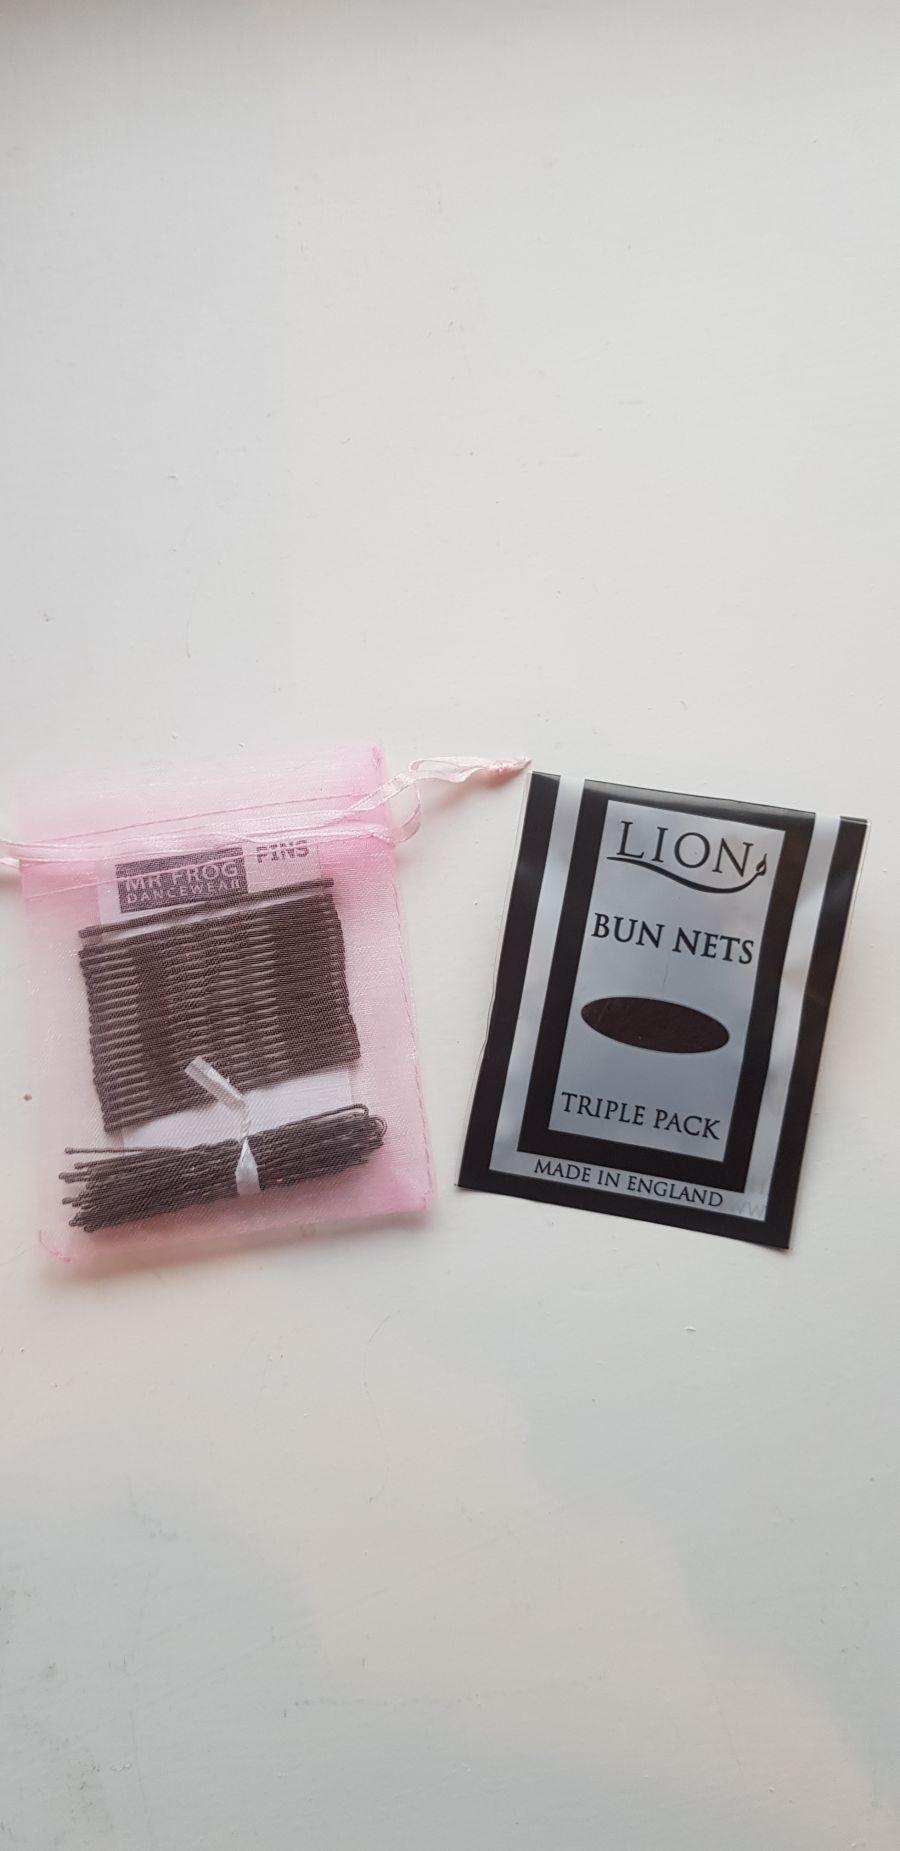 Bun nets, clips & pin pack